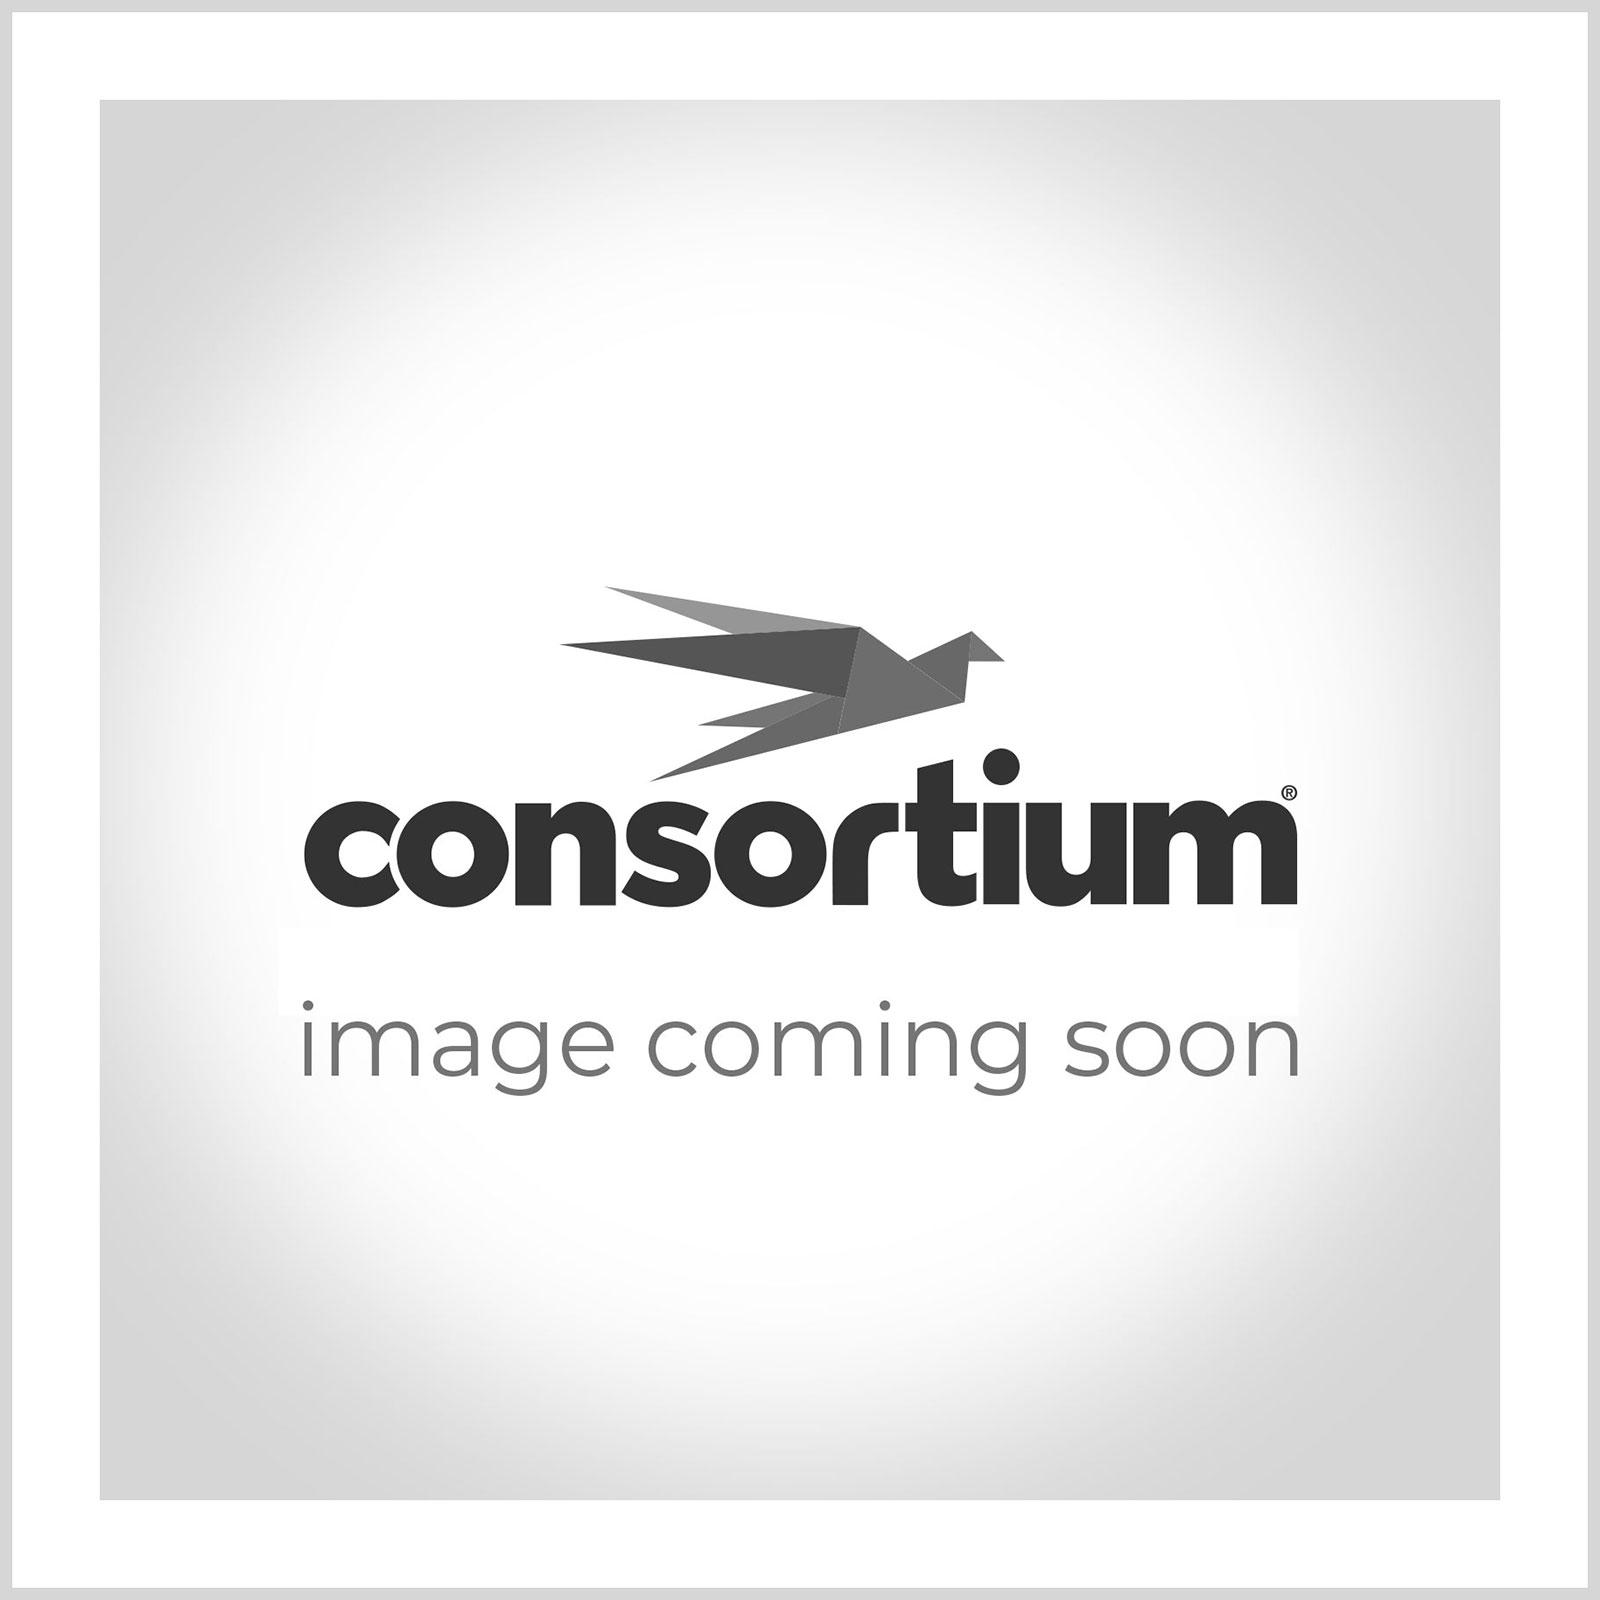 2 in 1 LeapTop Laptop